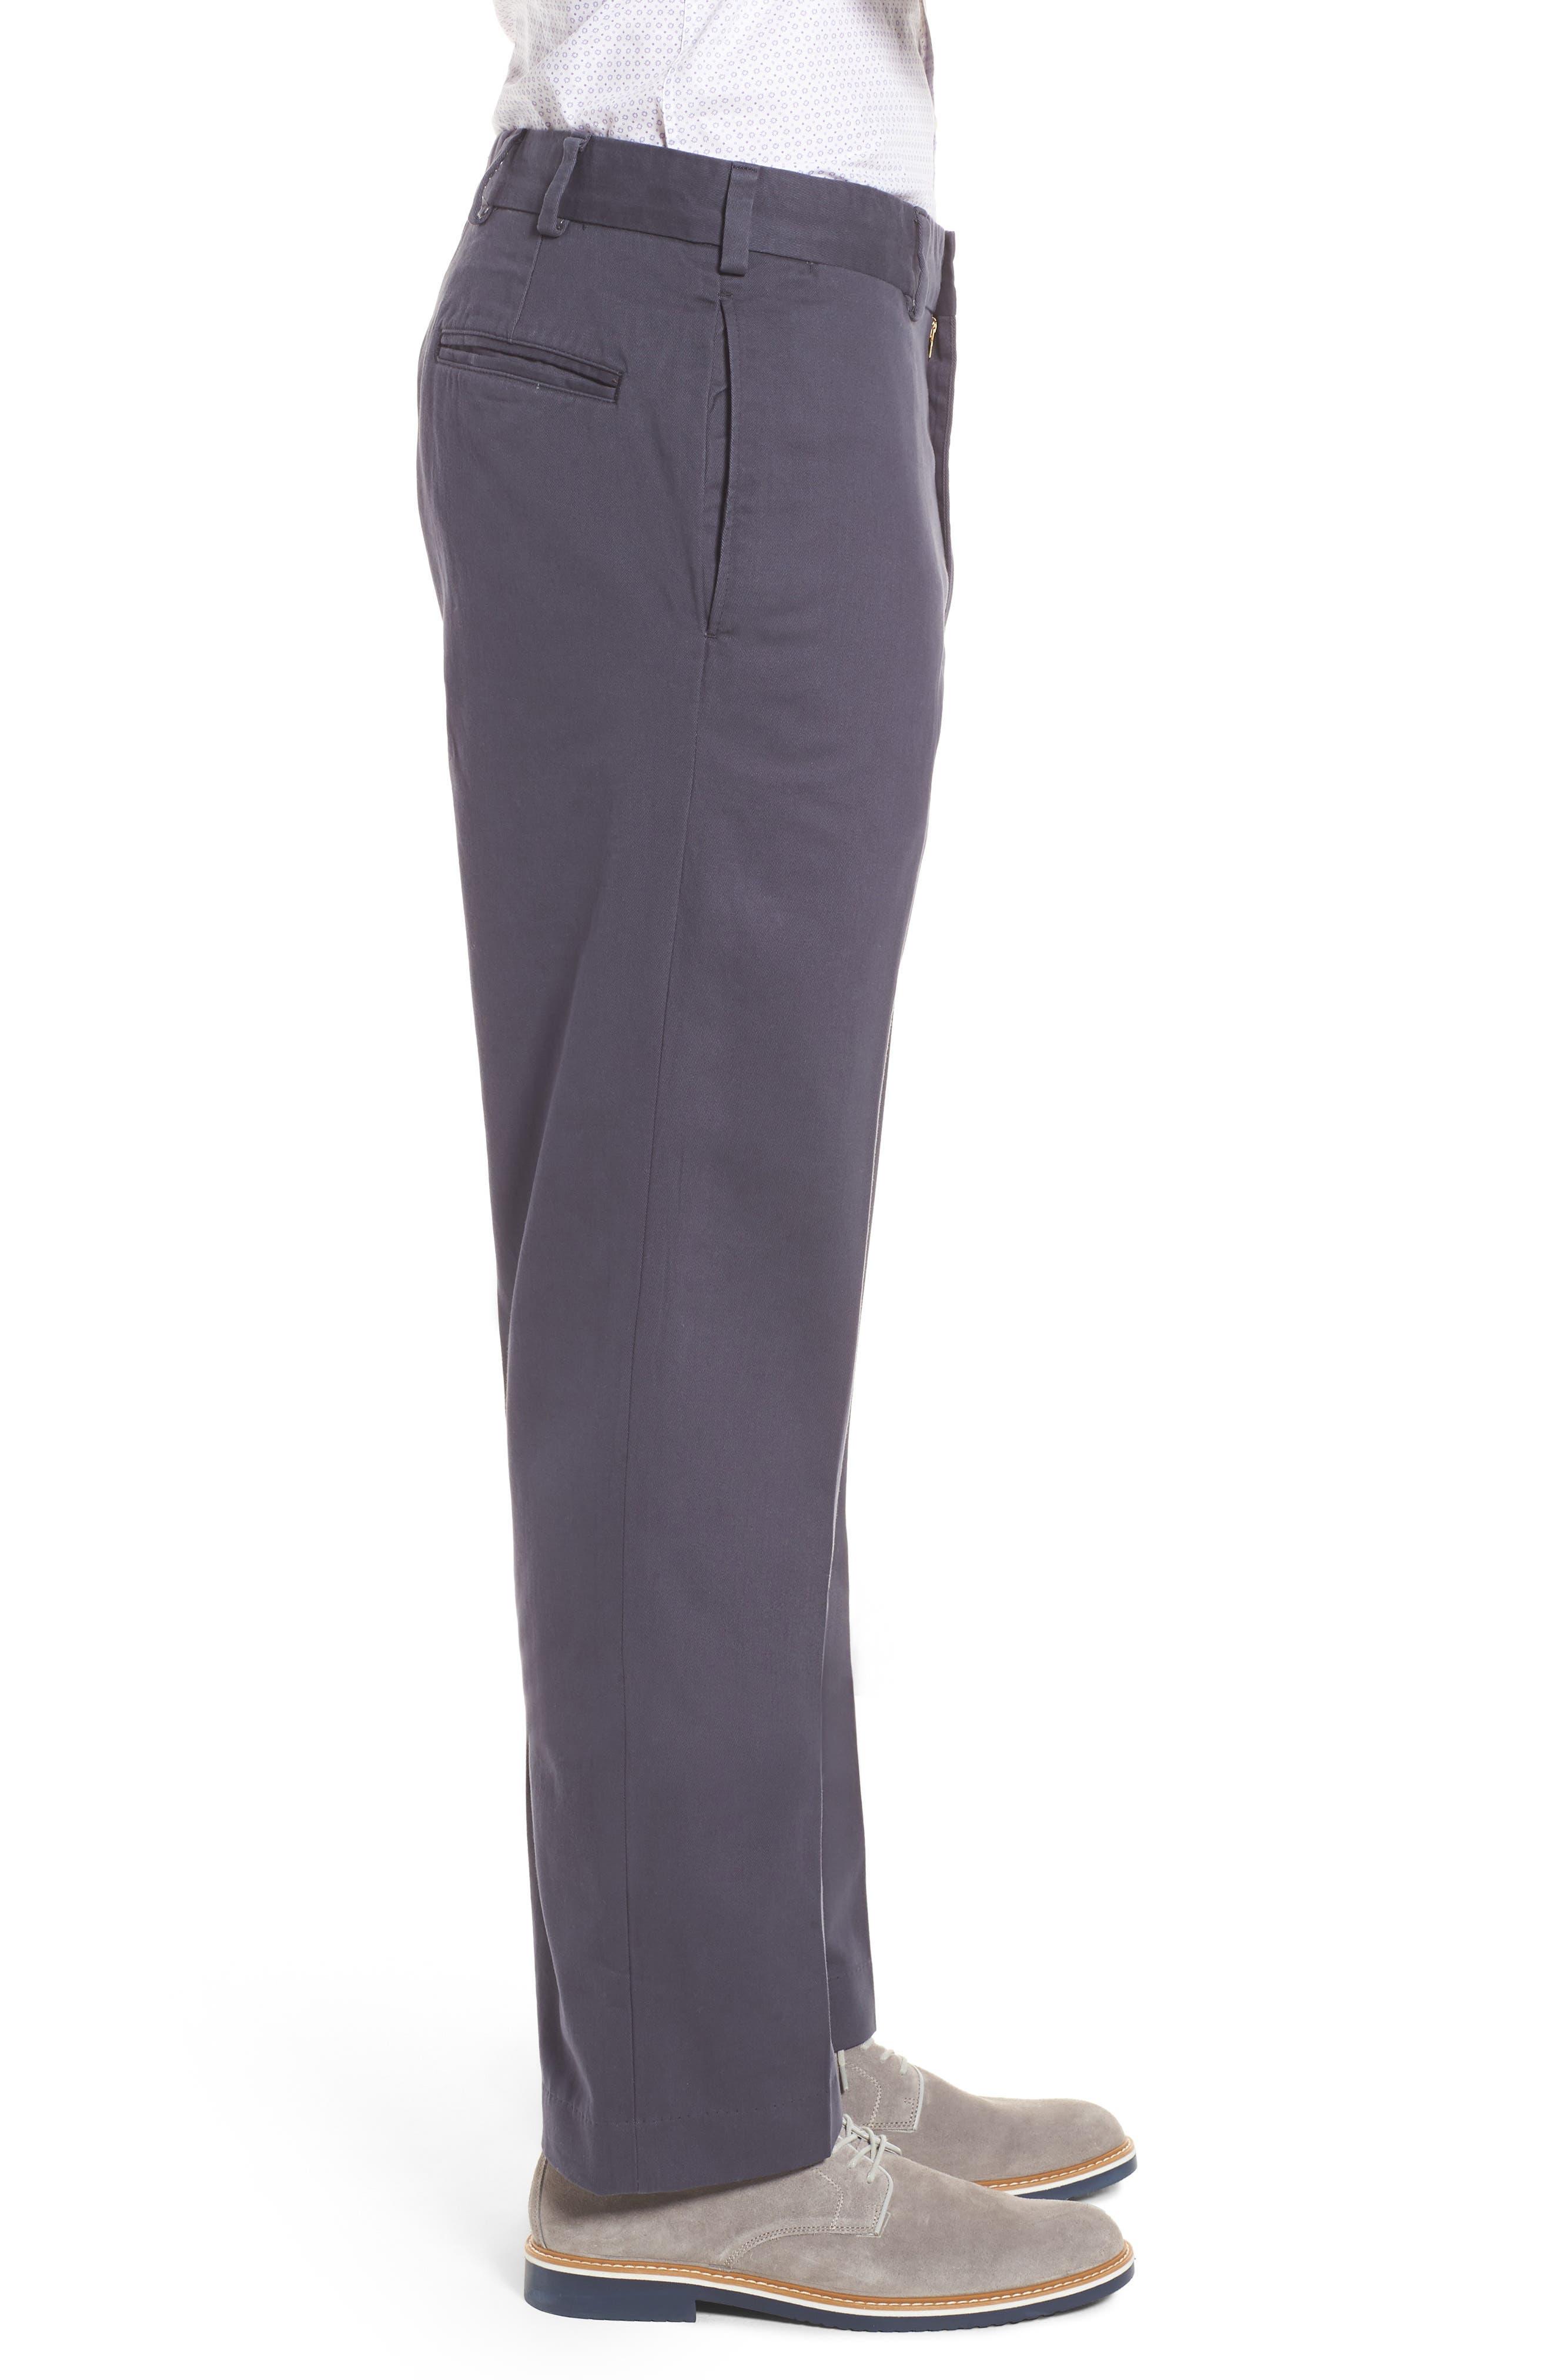 M2 Classic Fit Flat Front Vintage Twill Pants,                             Alternate thumbnail 3, color,